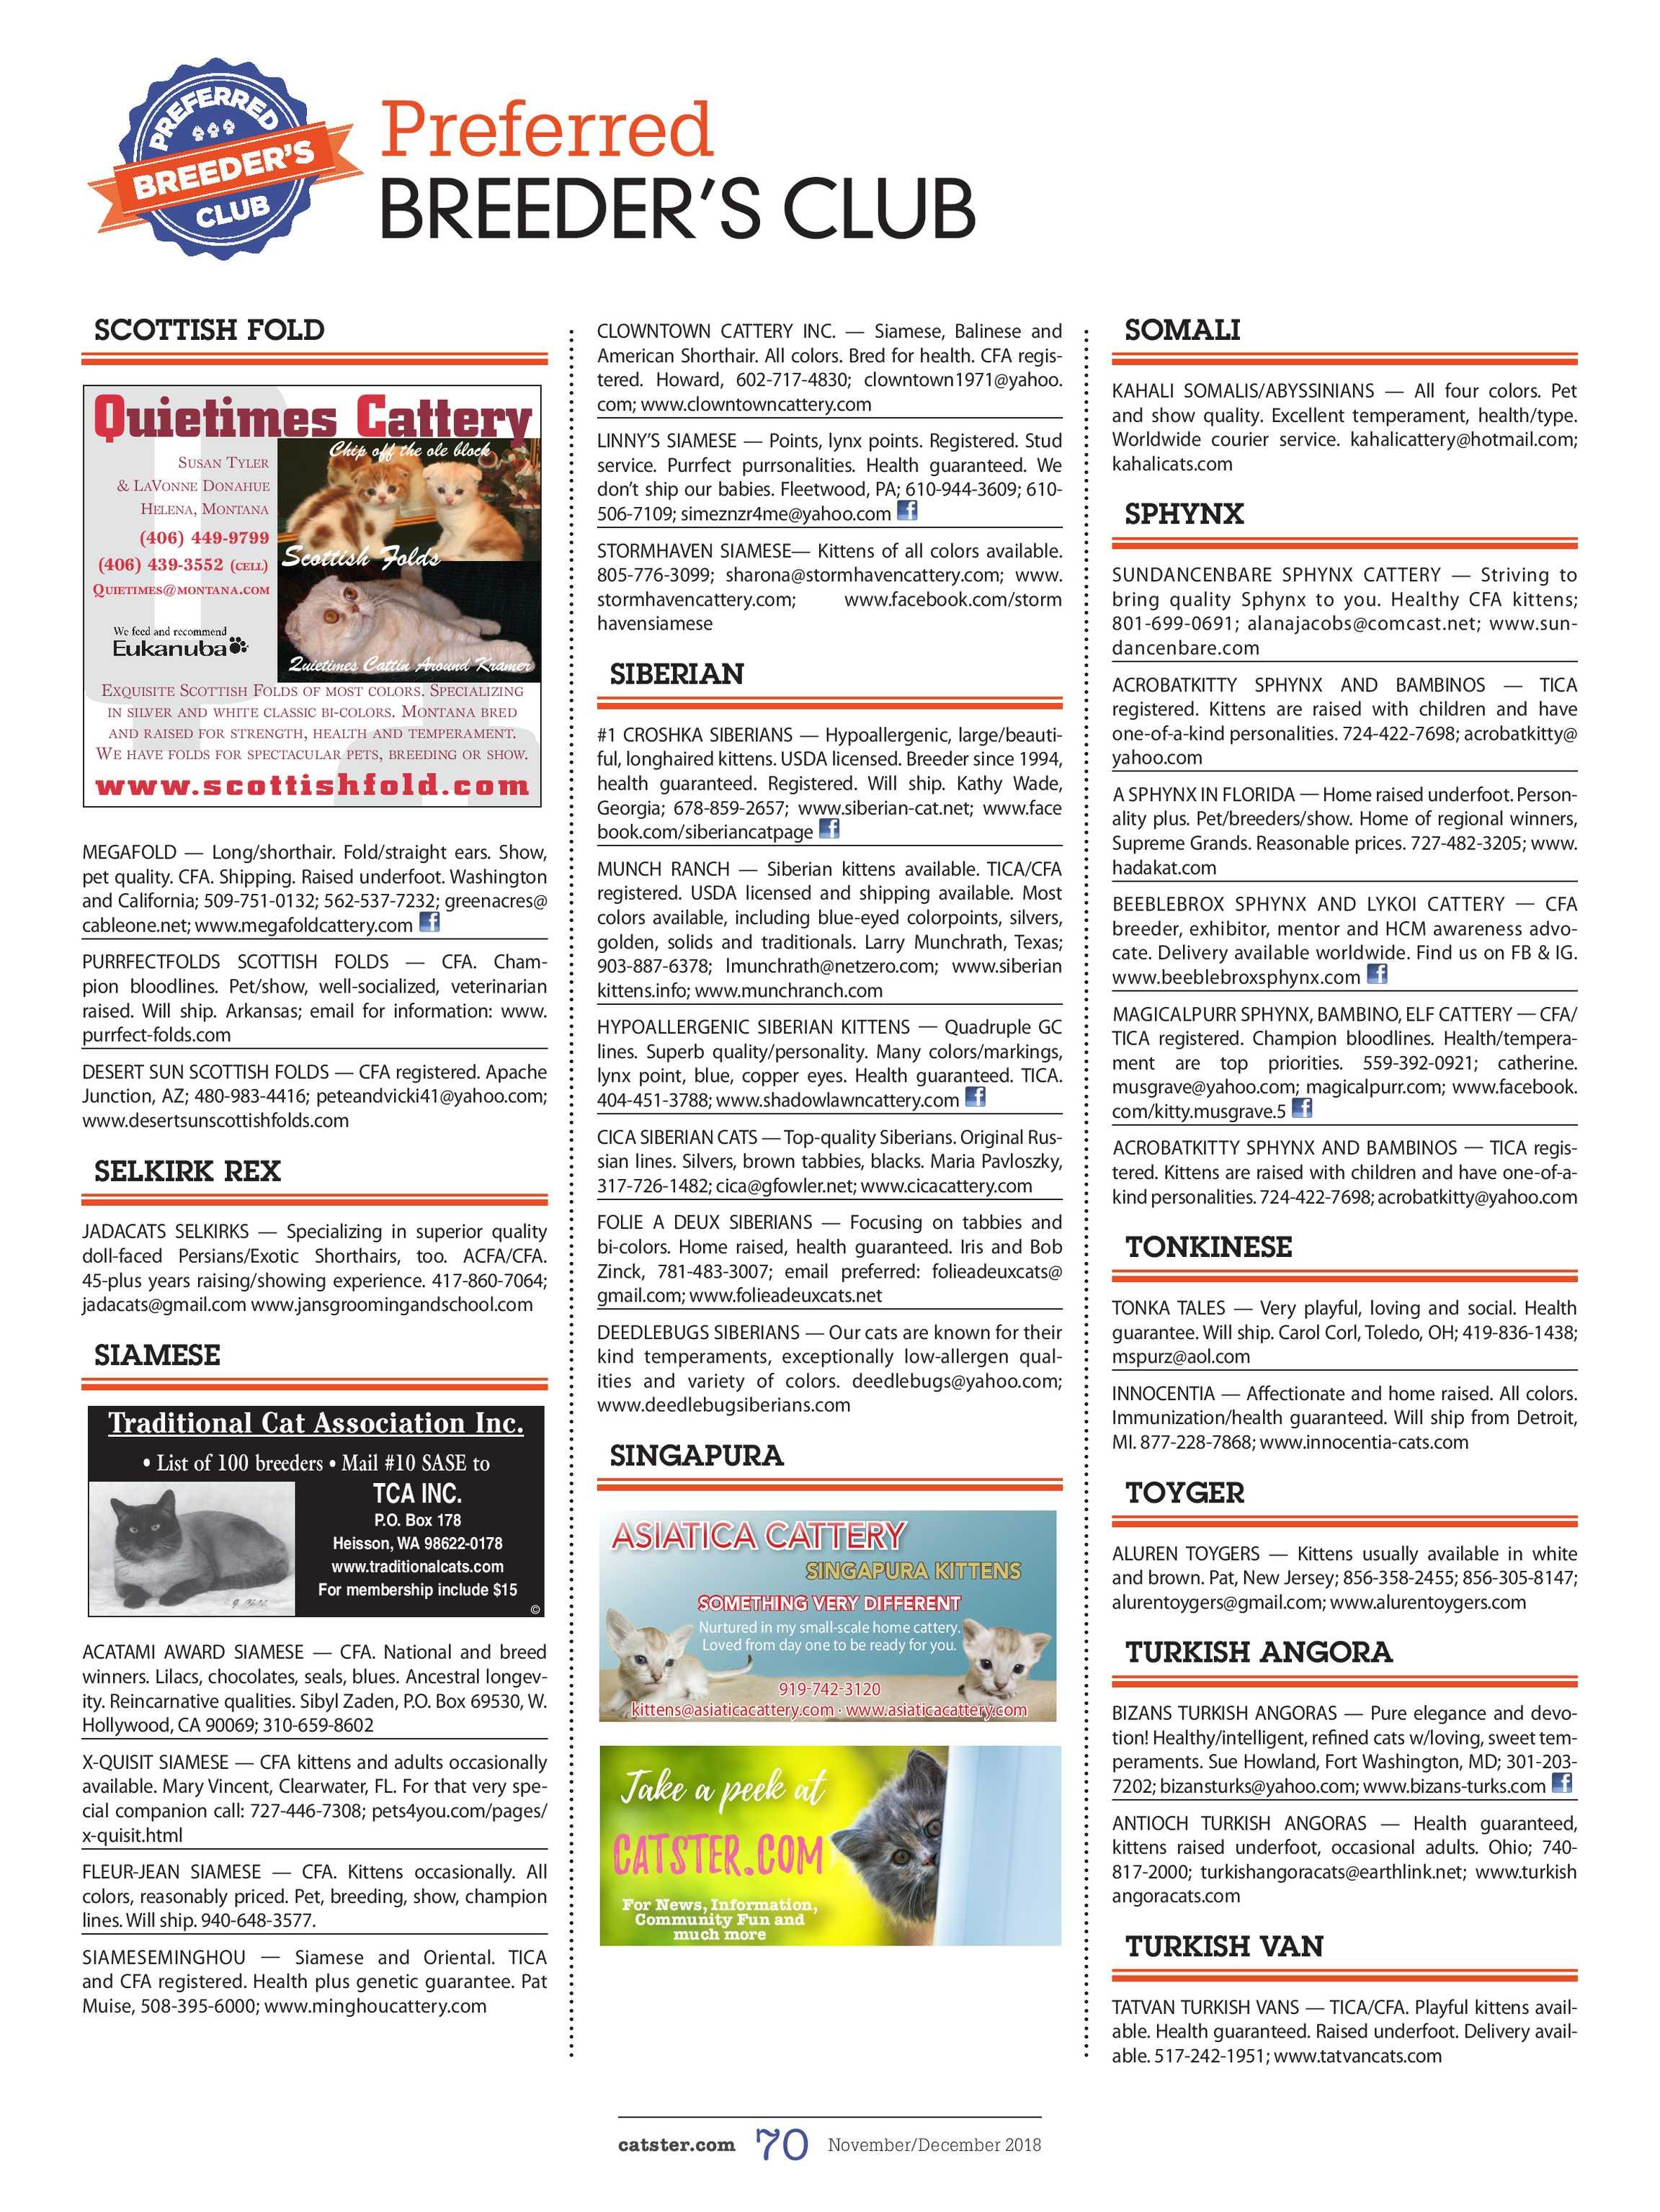 Catster Magazine - November/December 2018 - page 71